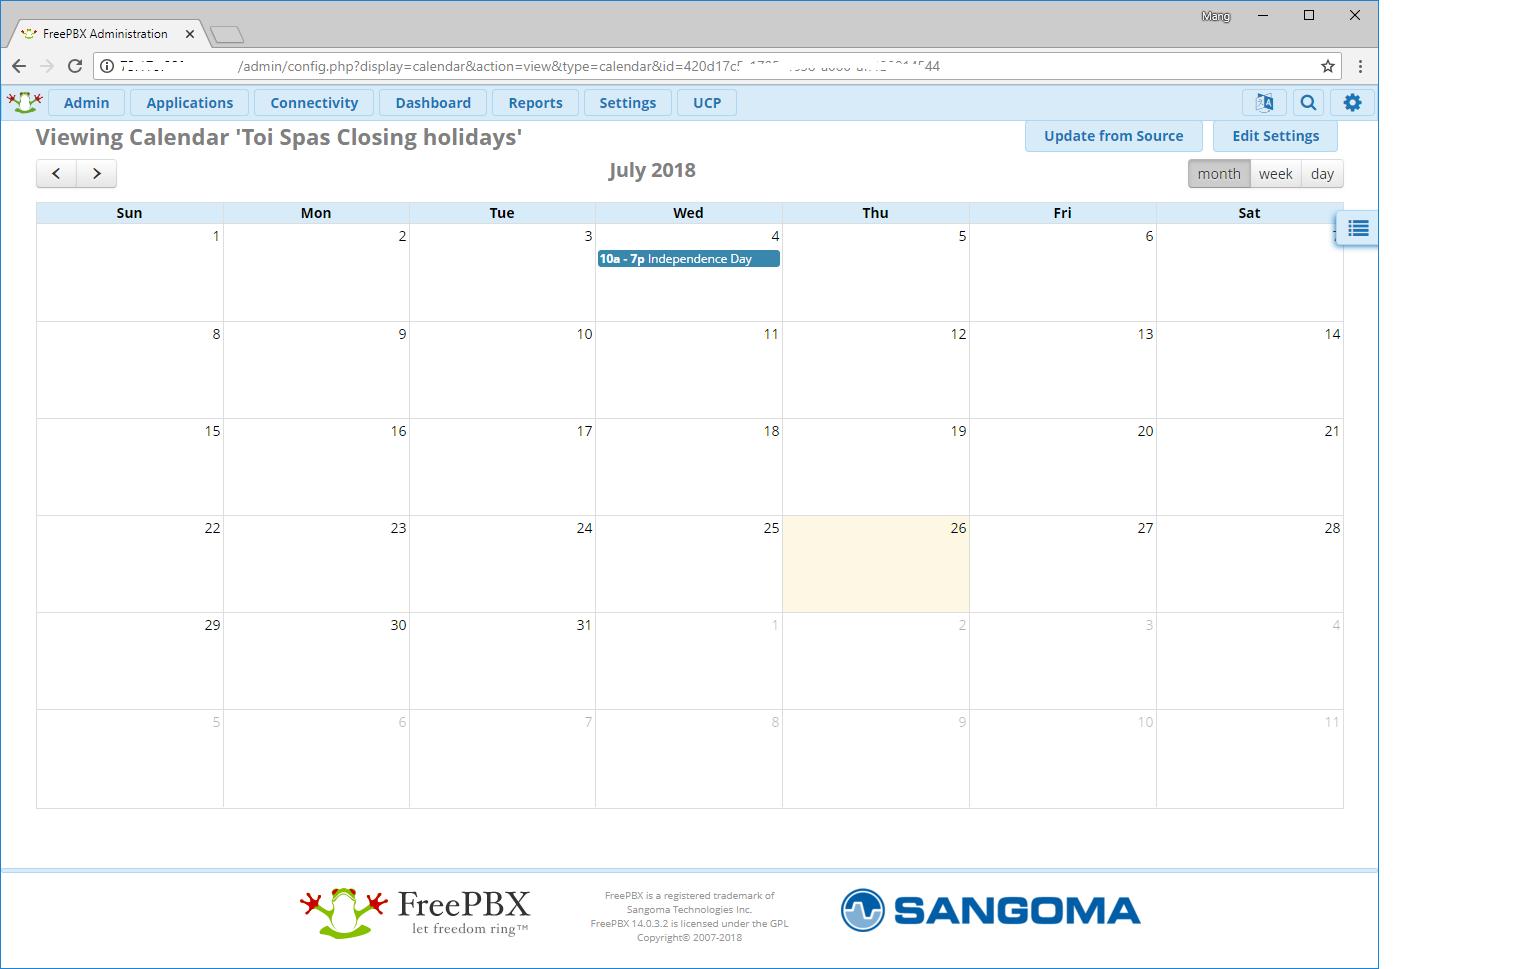 FREEPBX-17873] Calendar read ical from google